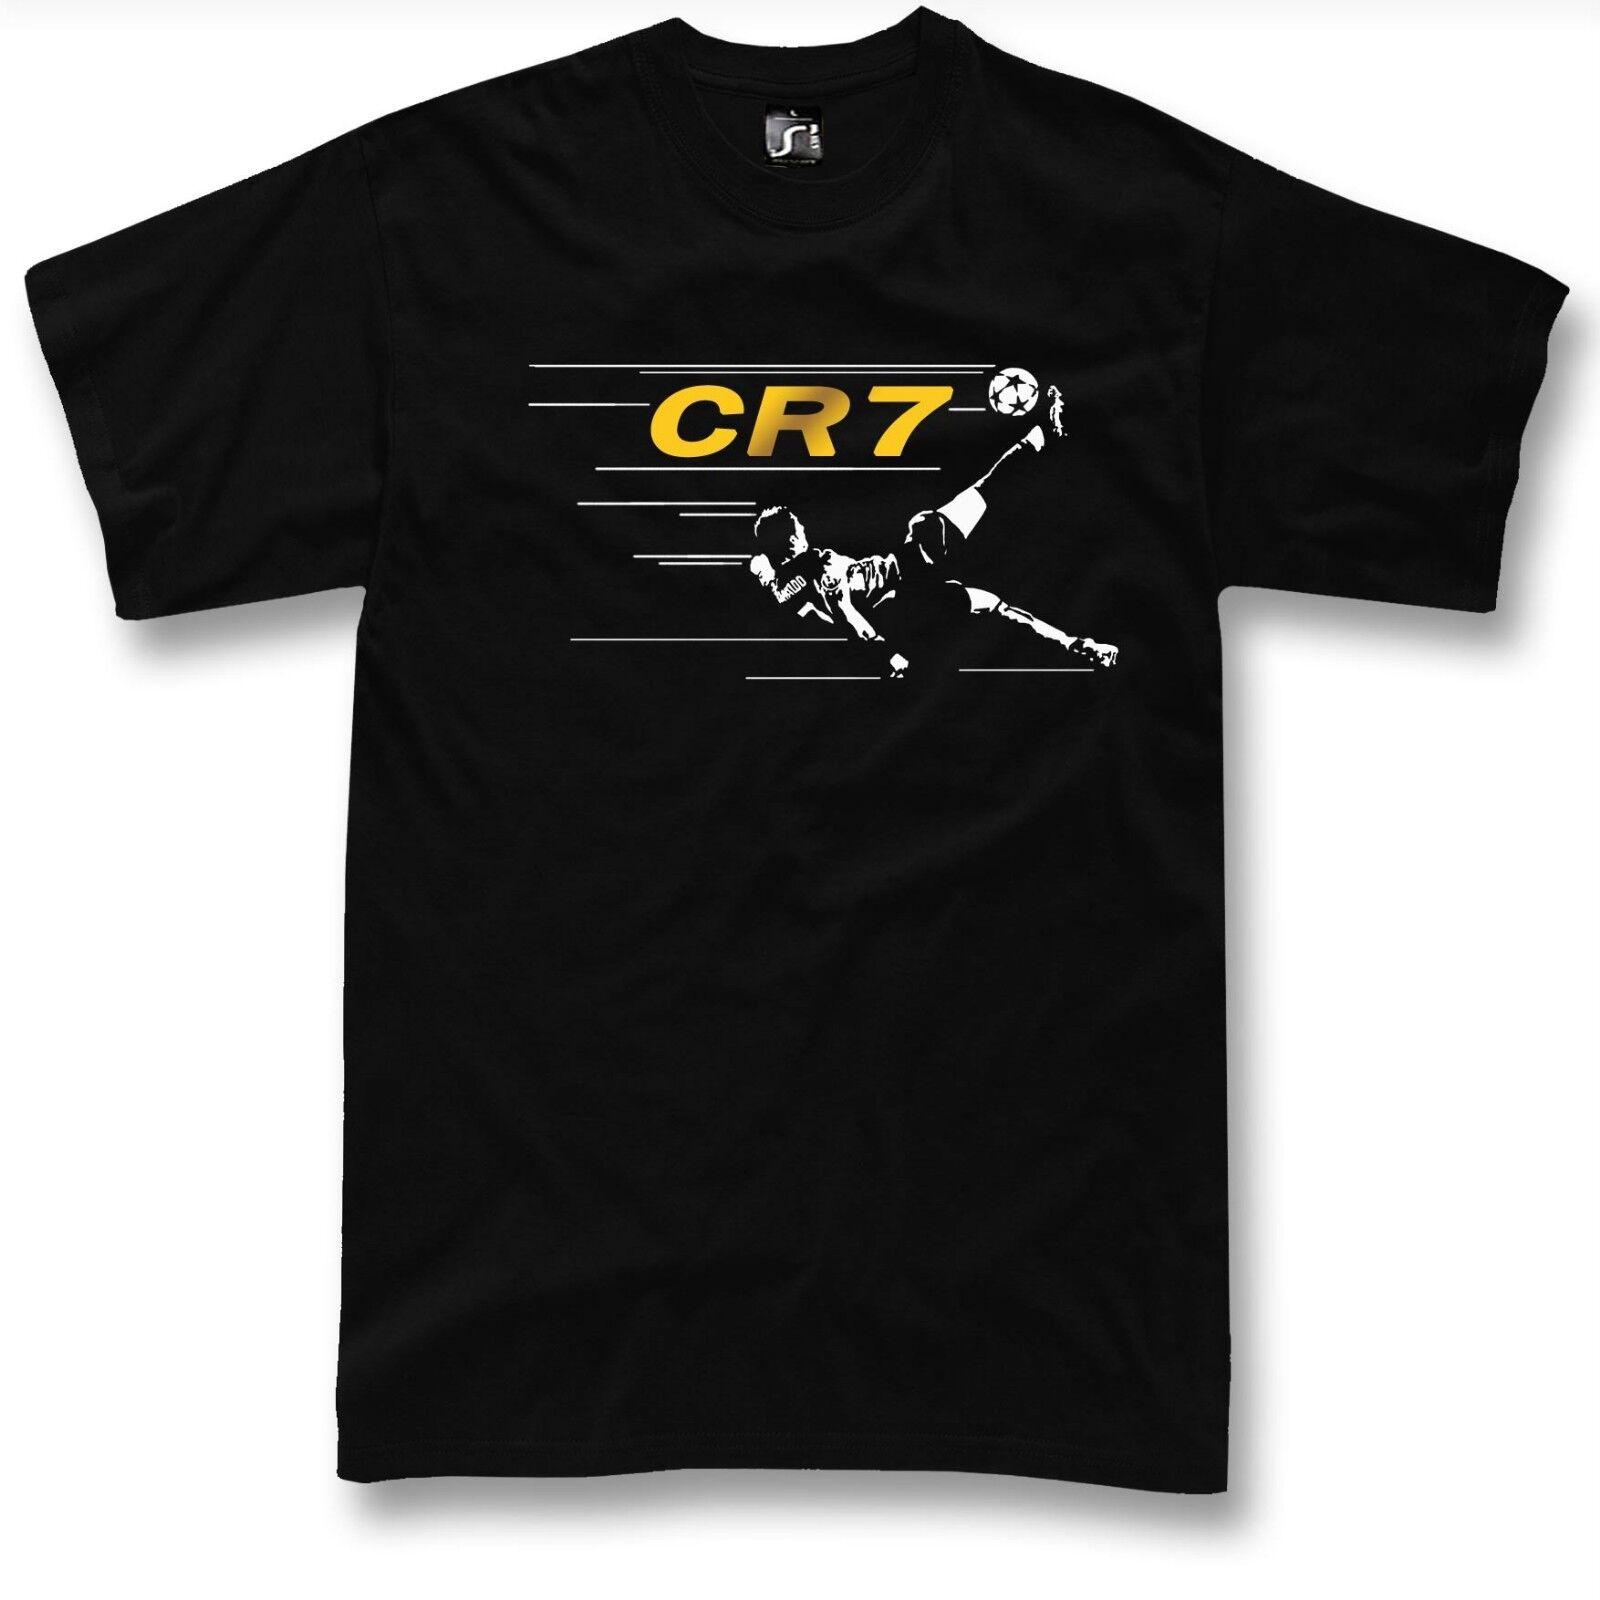 Ronaldo t-shirt goal vs juventus bicycle kick real madrid cr7 new tshirt